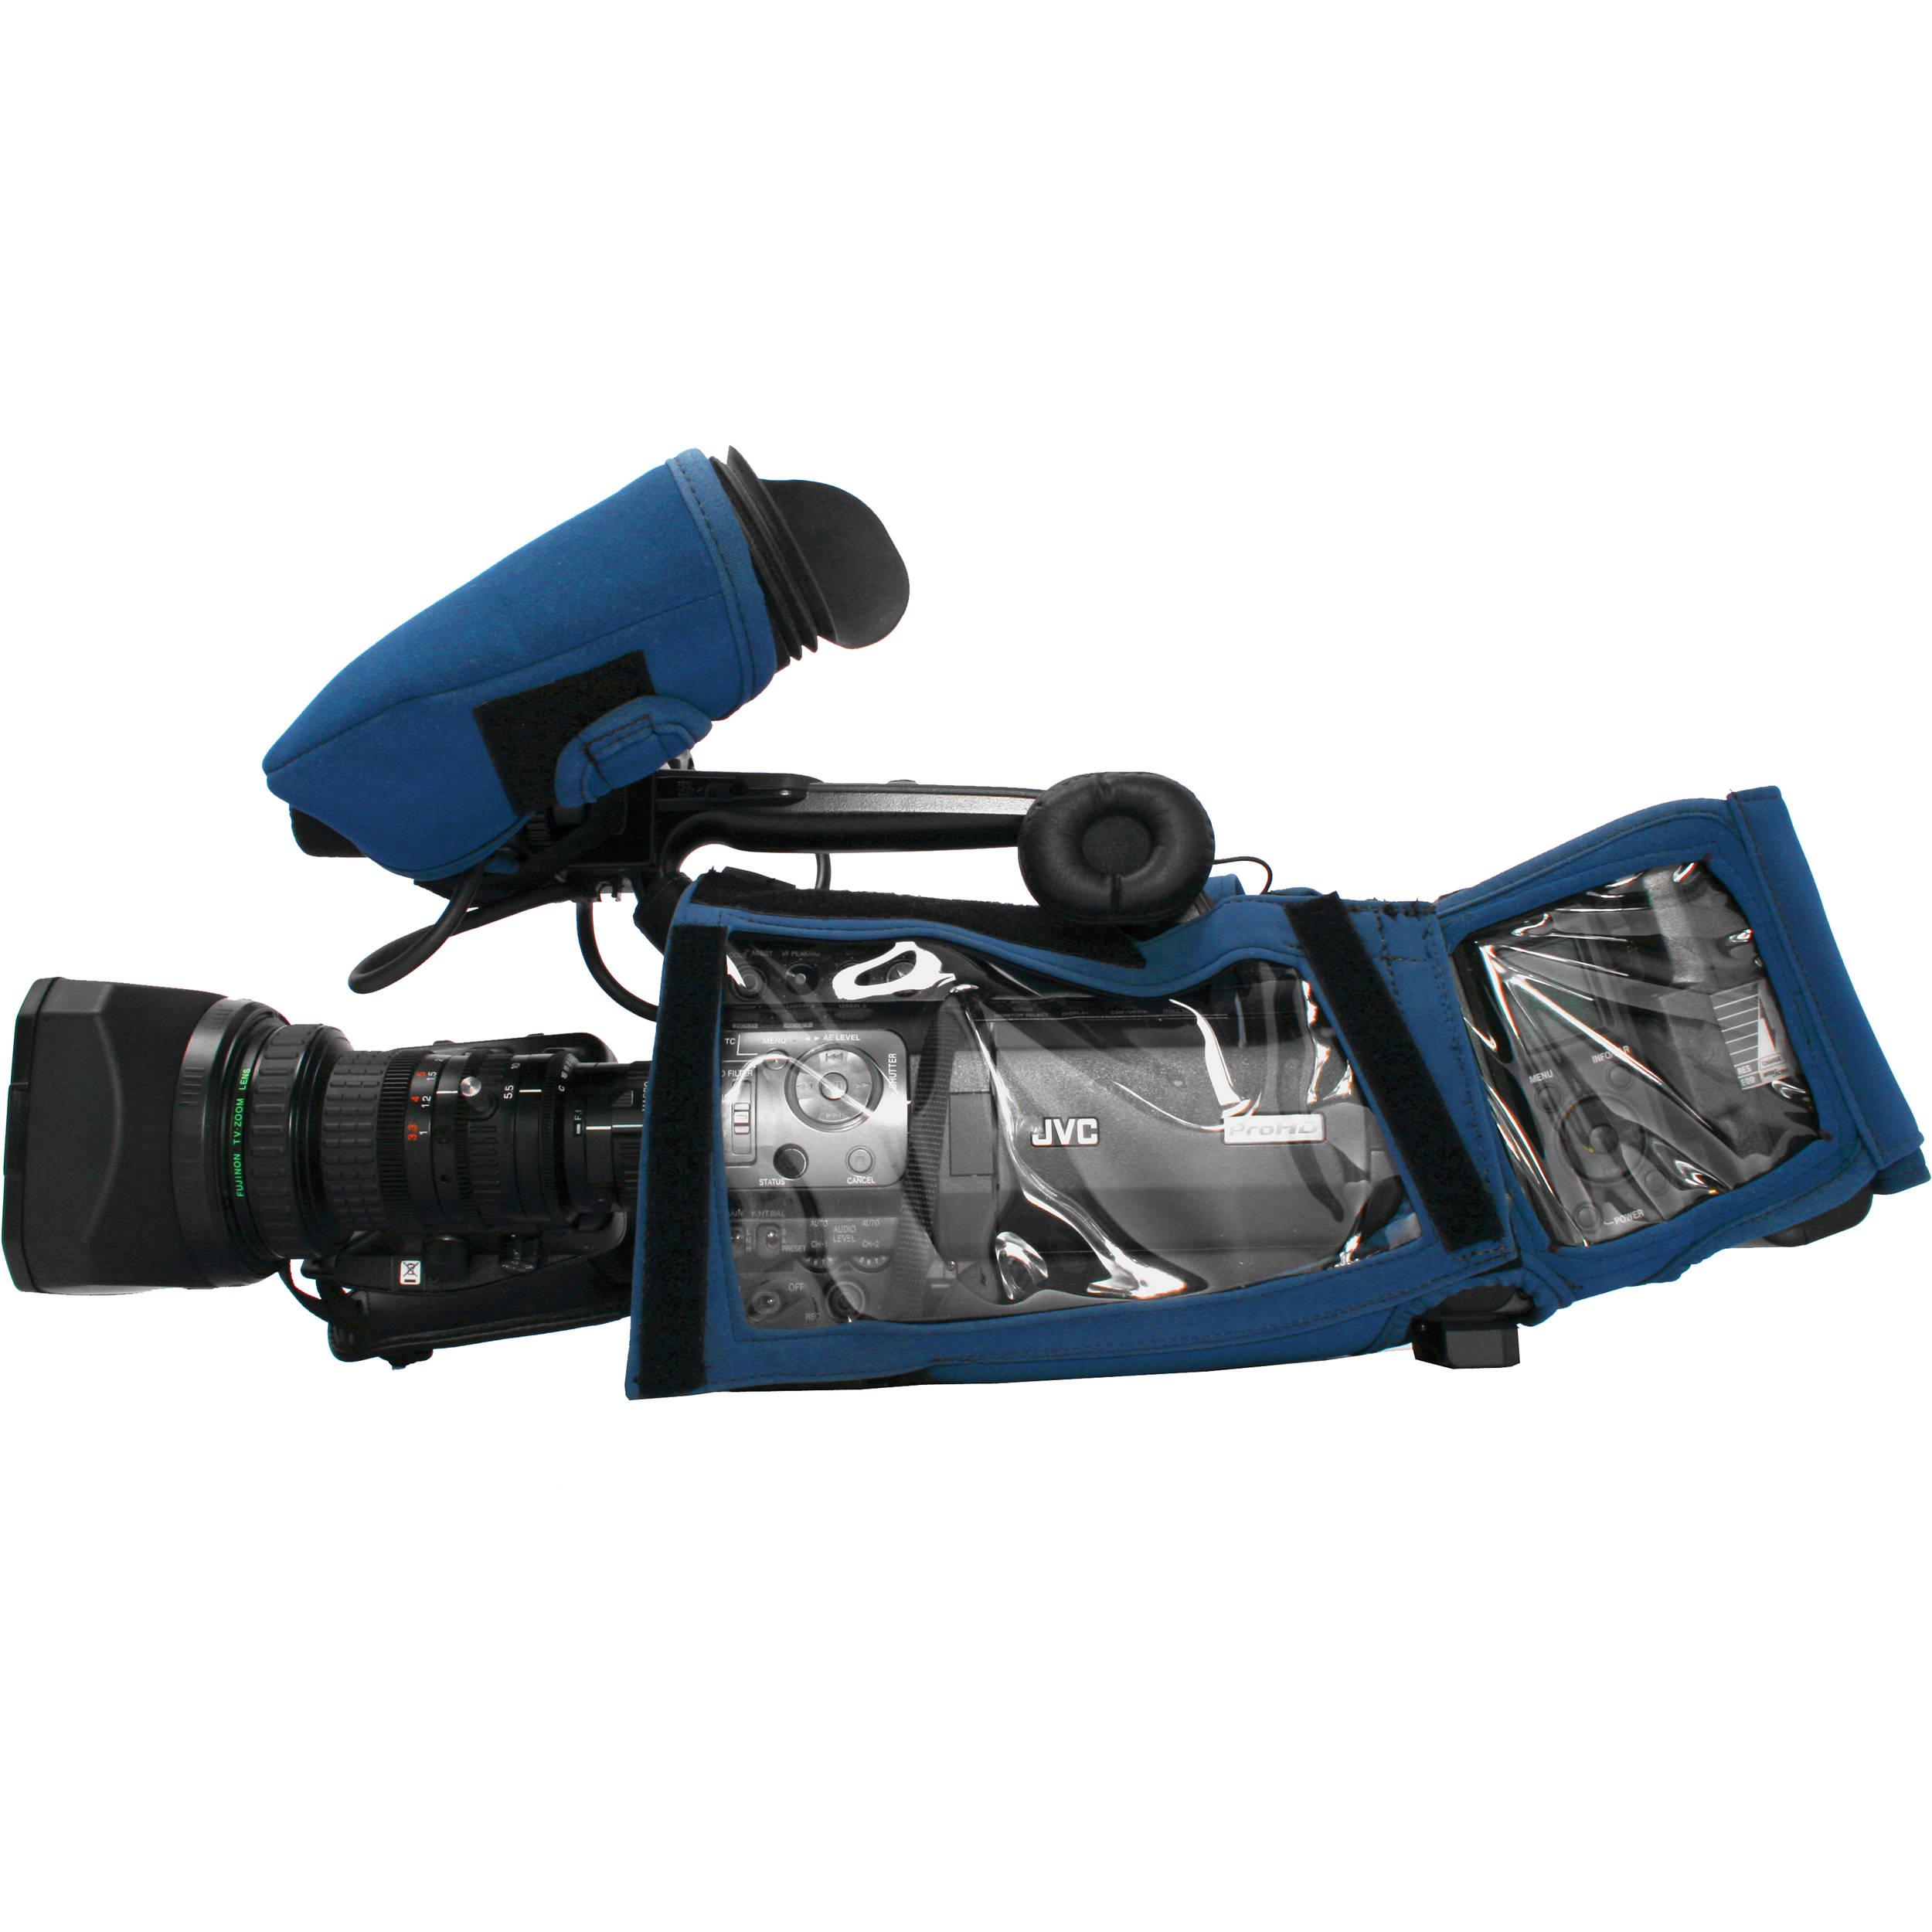 Porta Tv Camera.Porta Brace Camera Body Armor For Jvc Gy Hm850 Camcorder Blue